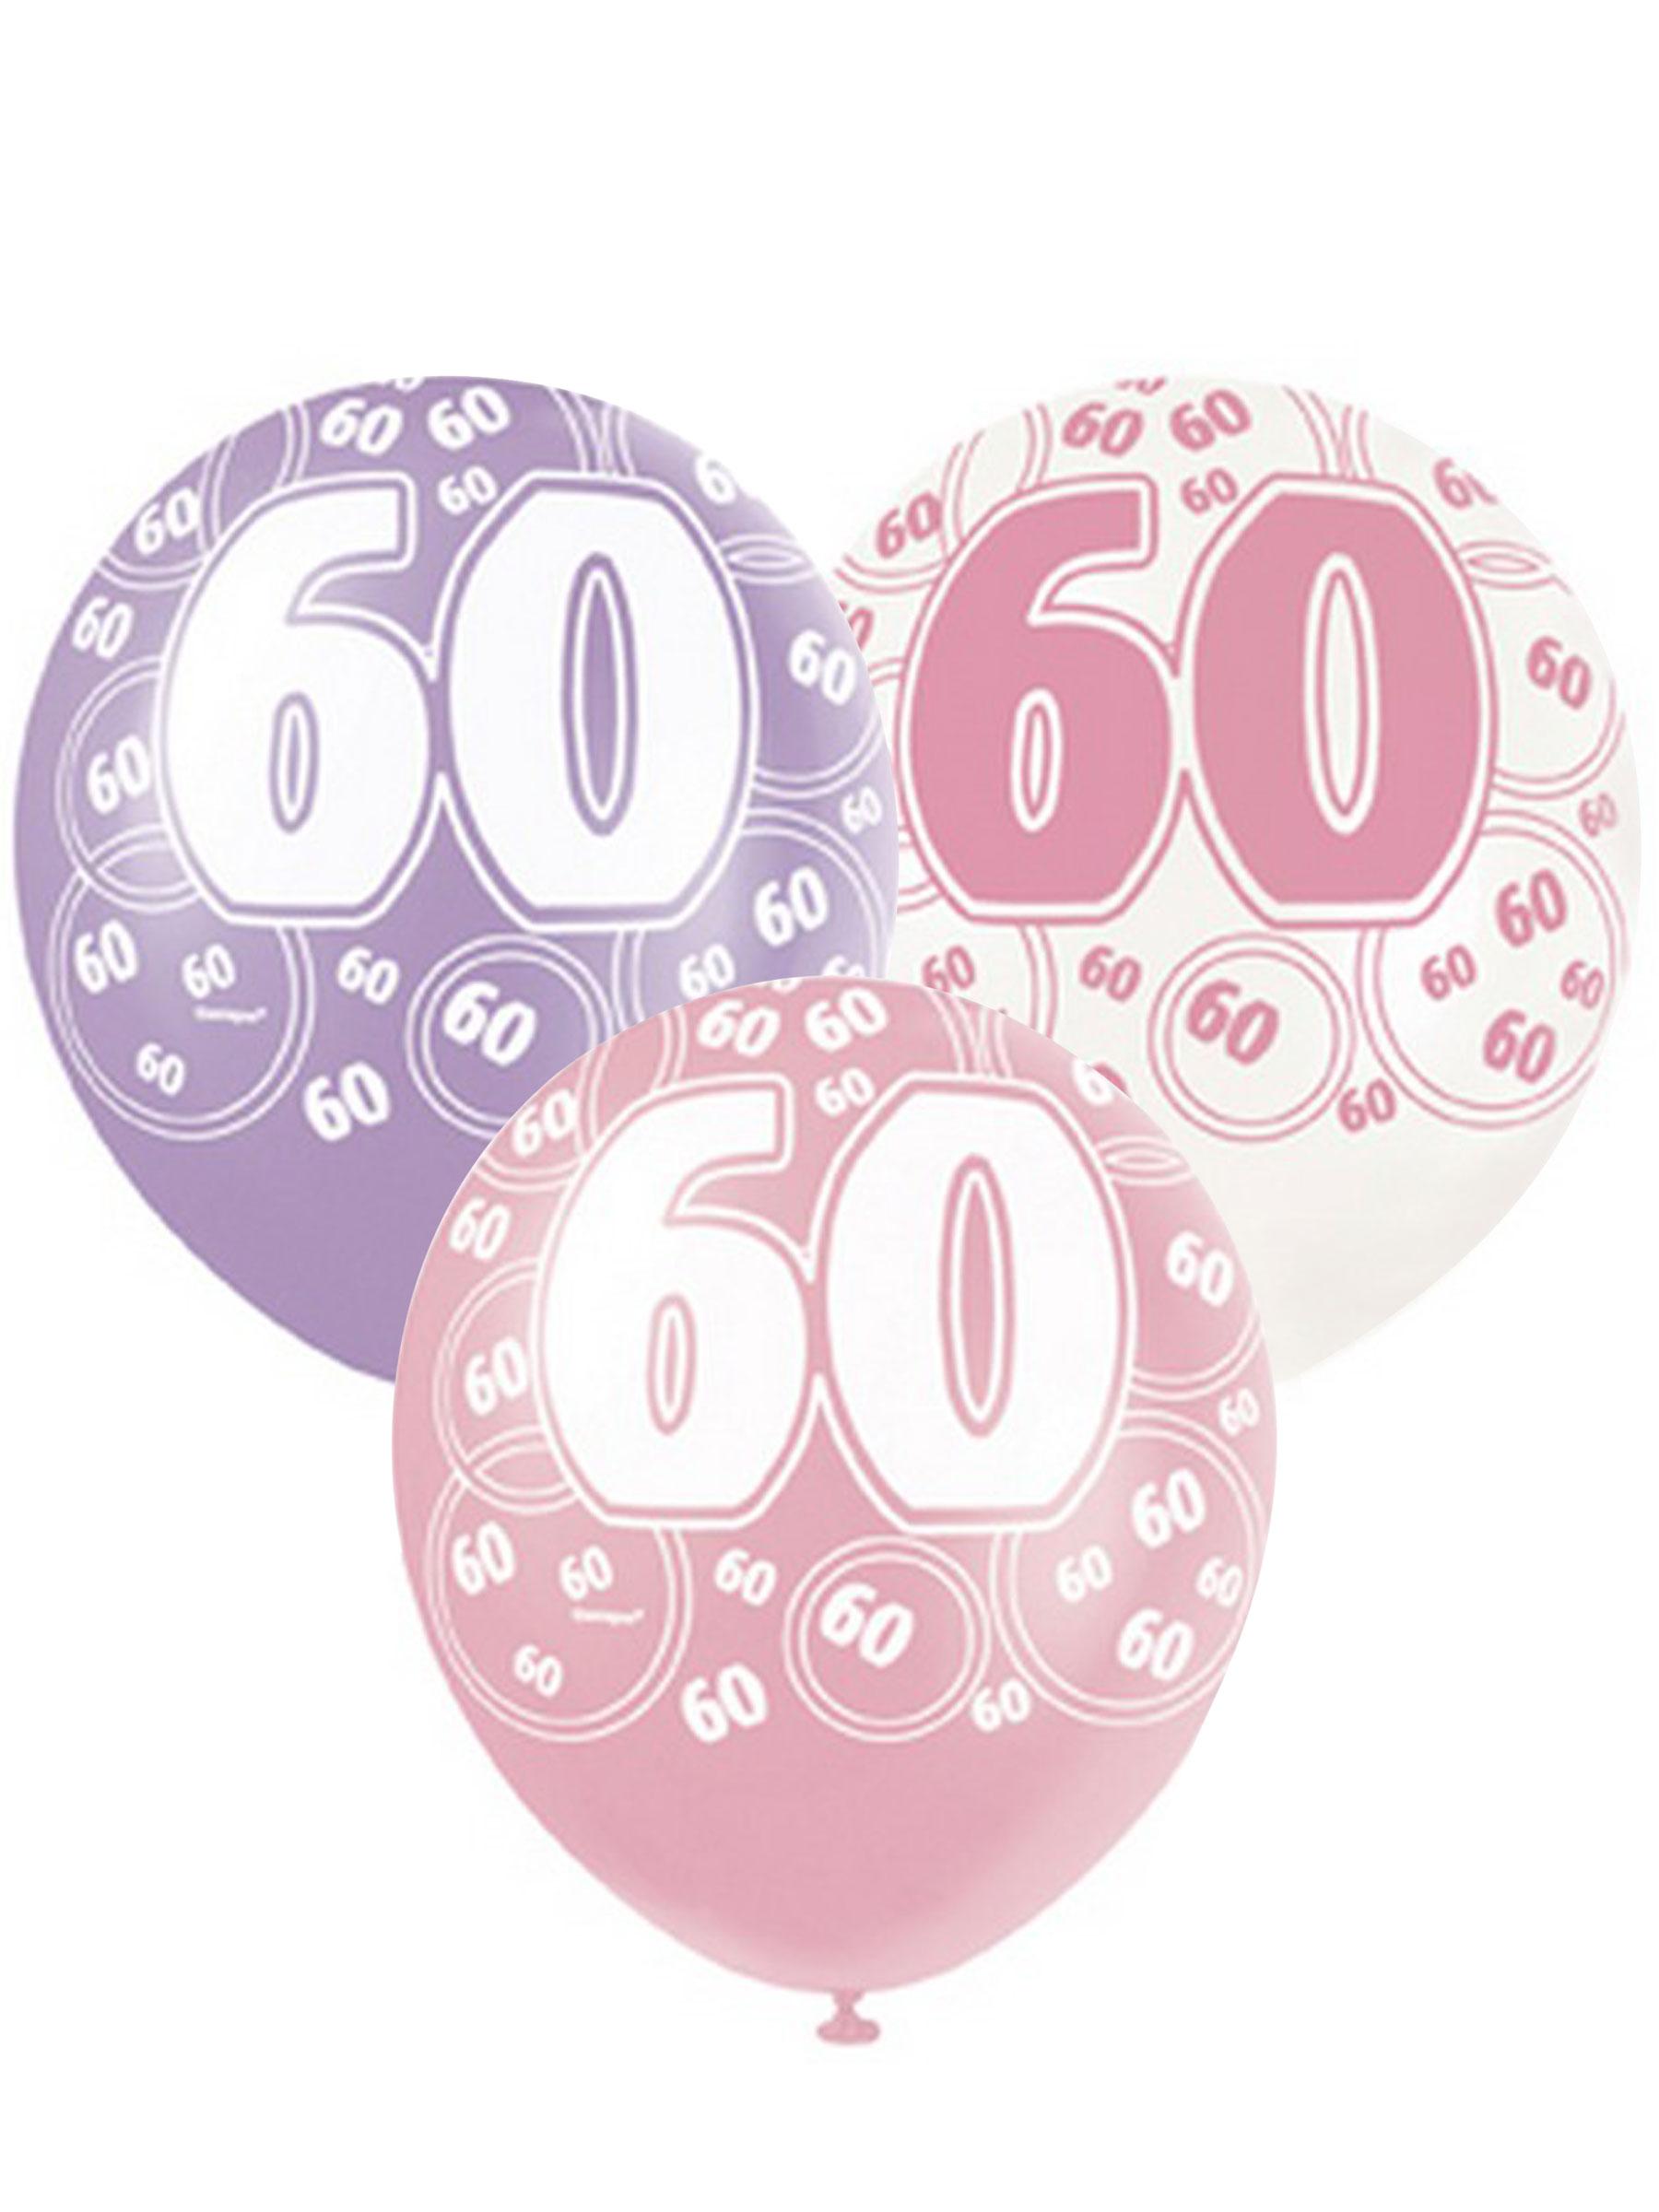 ballonnen 60 jaar Set roze ballonnen 60 jaar: Decoratie,en goedkope carnavalskleding  ballonnen 60 jaar